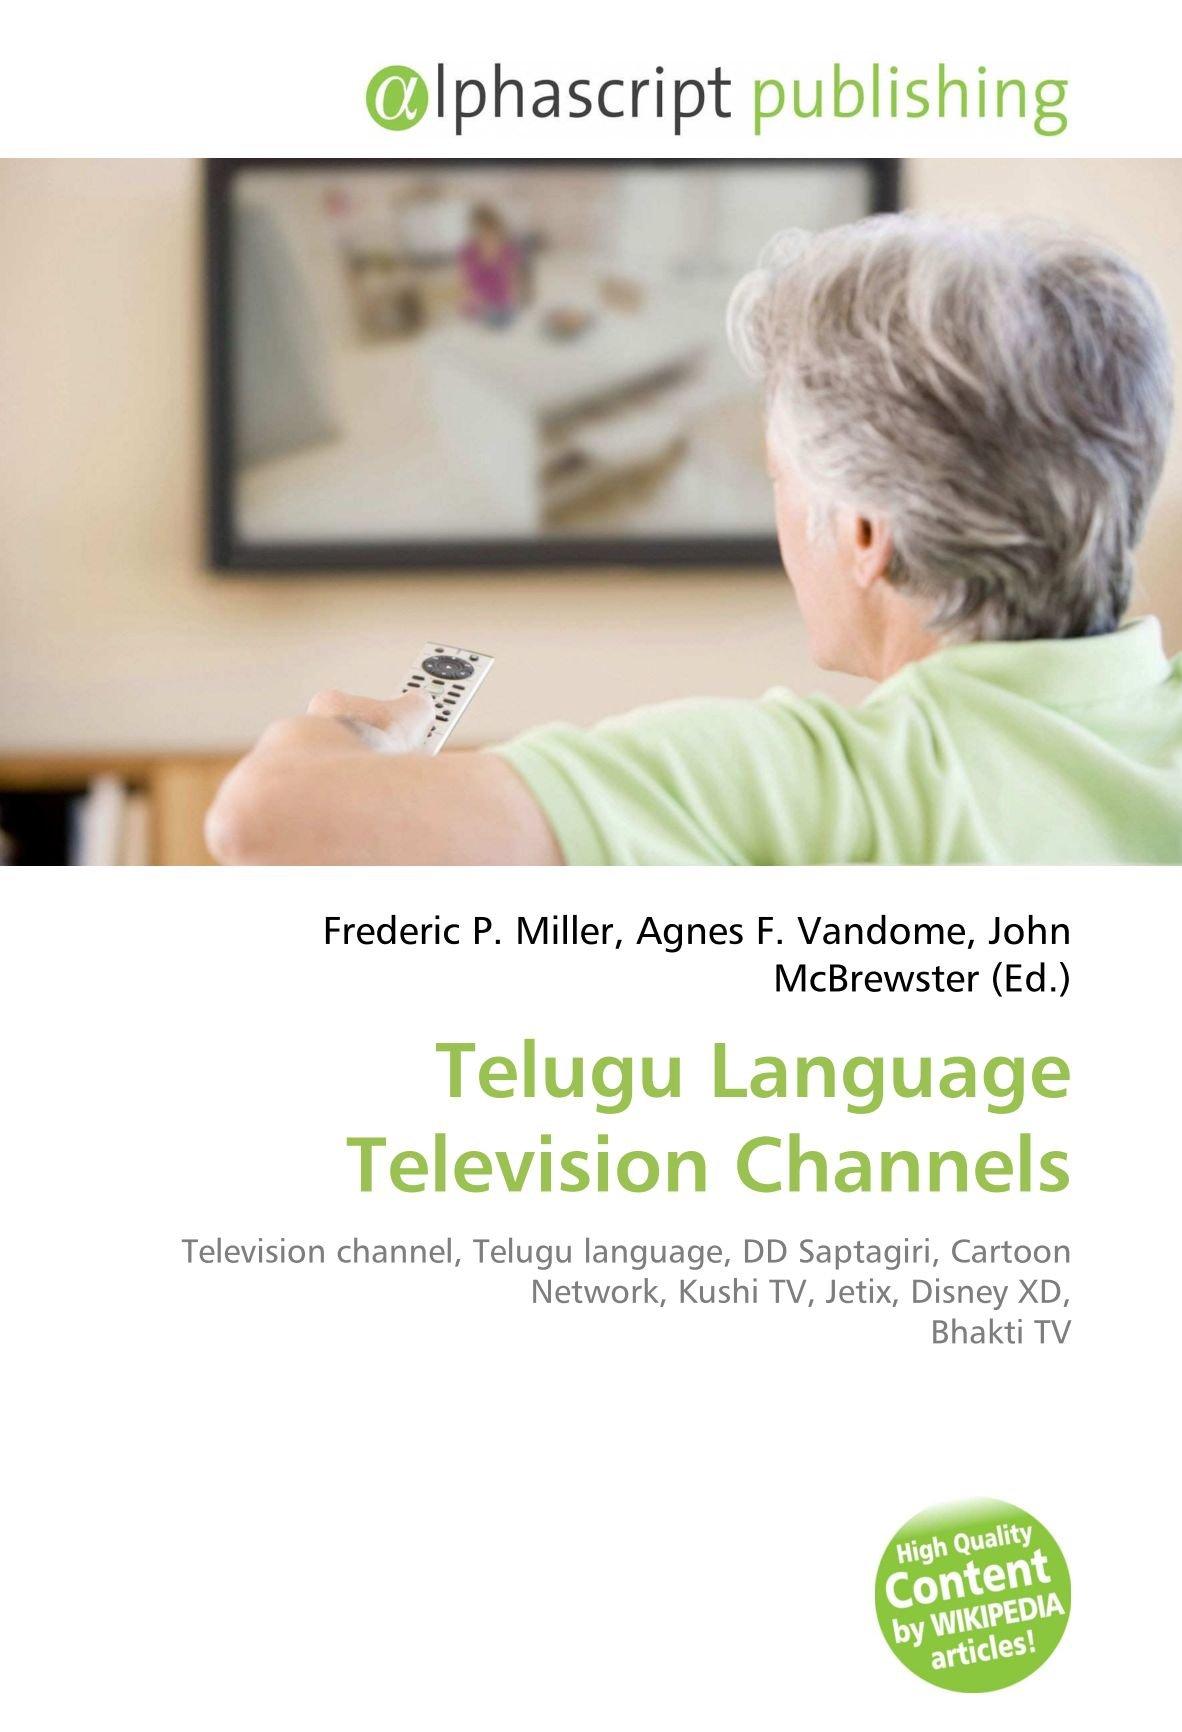 Telugu Language Television Channels: Television channel, Telugu language, DD Saptagiri, Cartoon Network, Kushi TV, Jetix, Disney XD, Bhakti TV: Amazon.es: Miller, Frederic P, Vandome, Agnes F, McBrewster, John: Libros en idiomas extranjeros